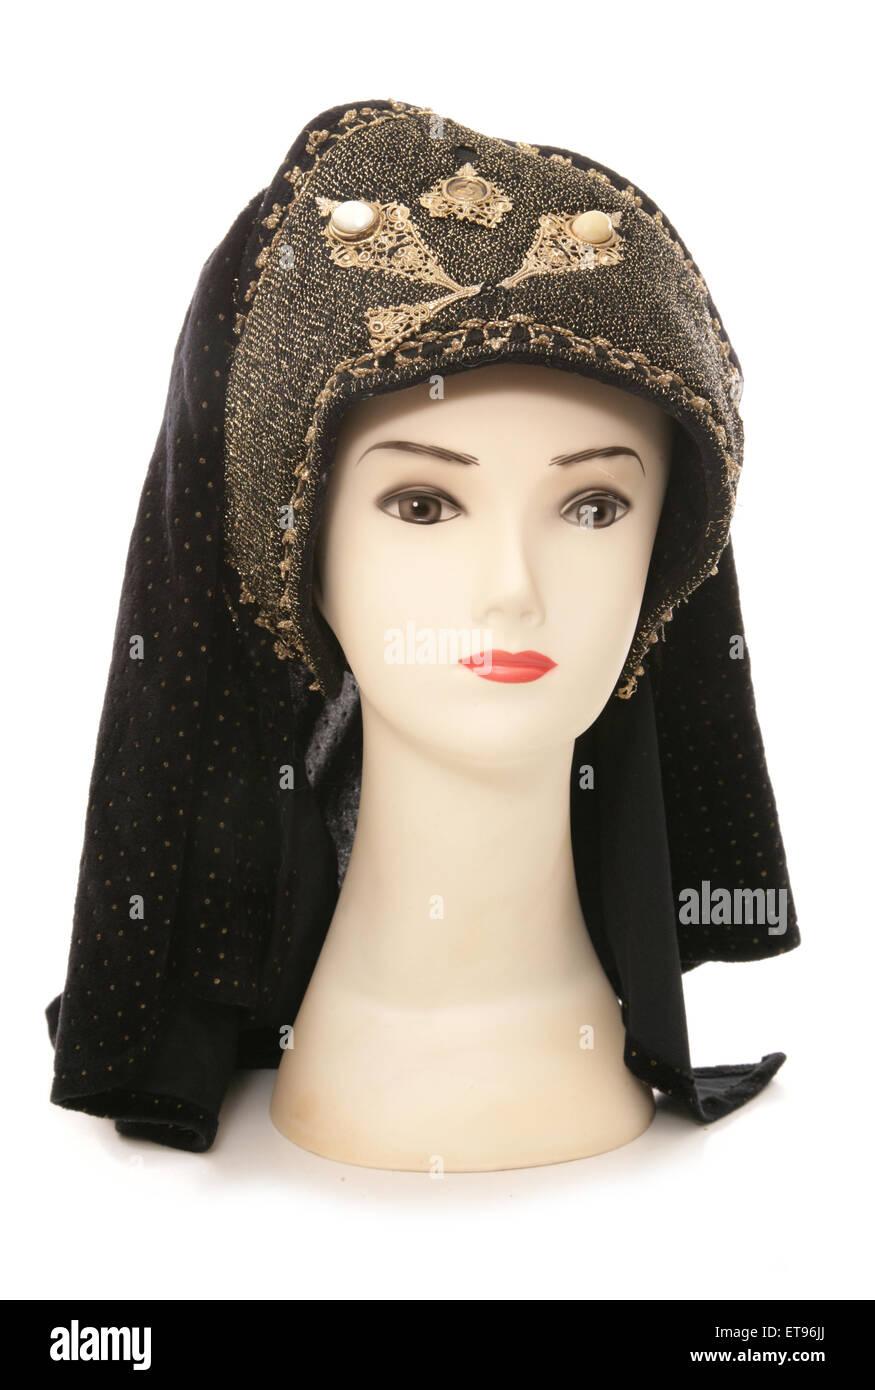 mannequin head with tudor headdress cutout - Stock Image